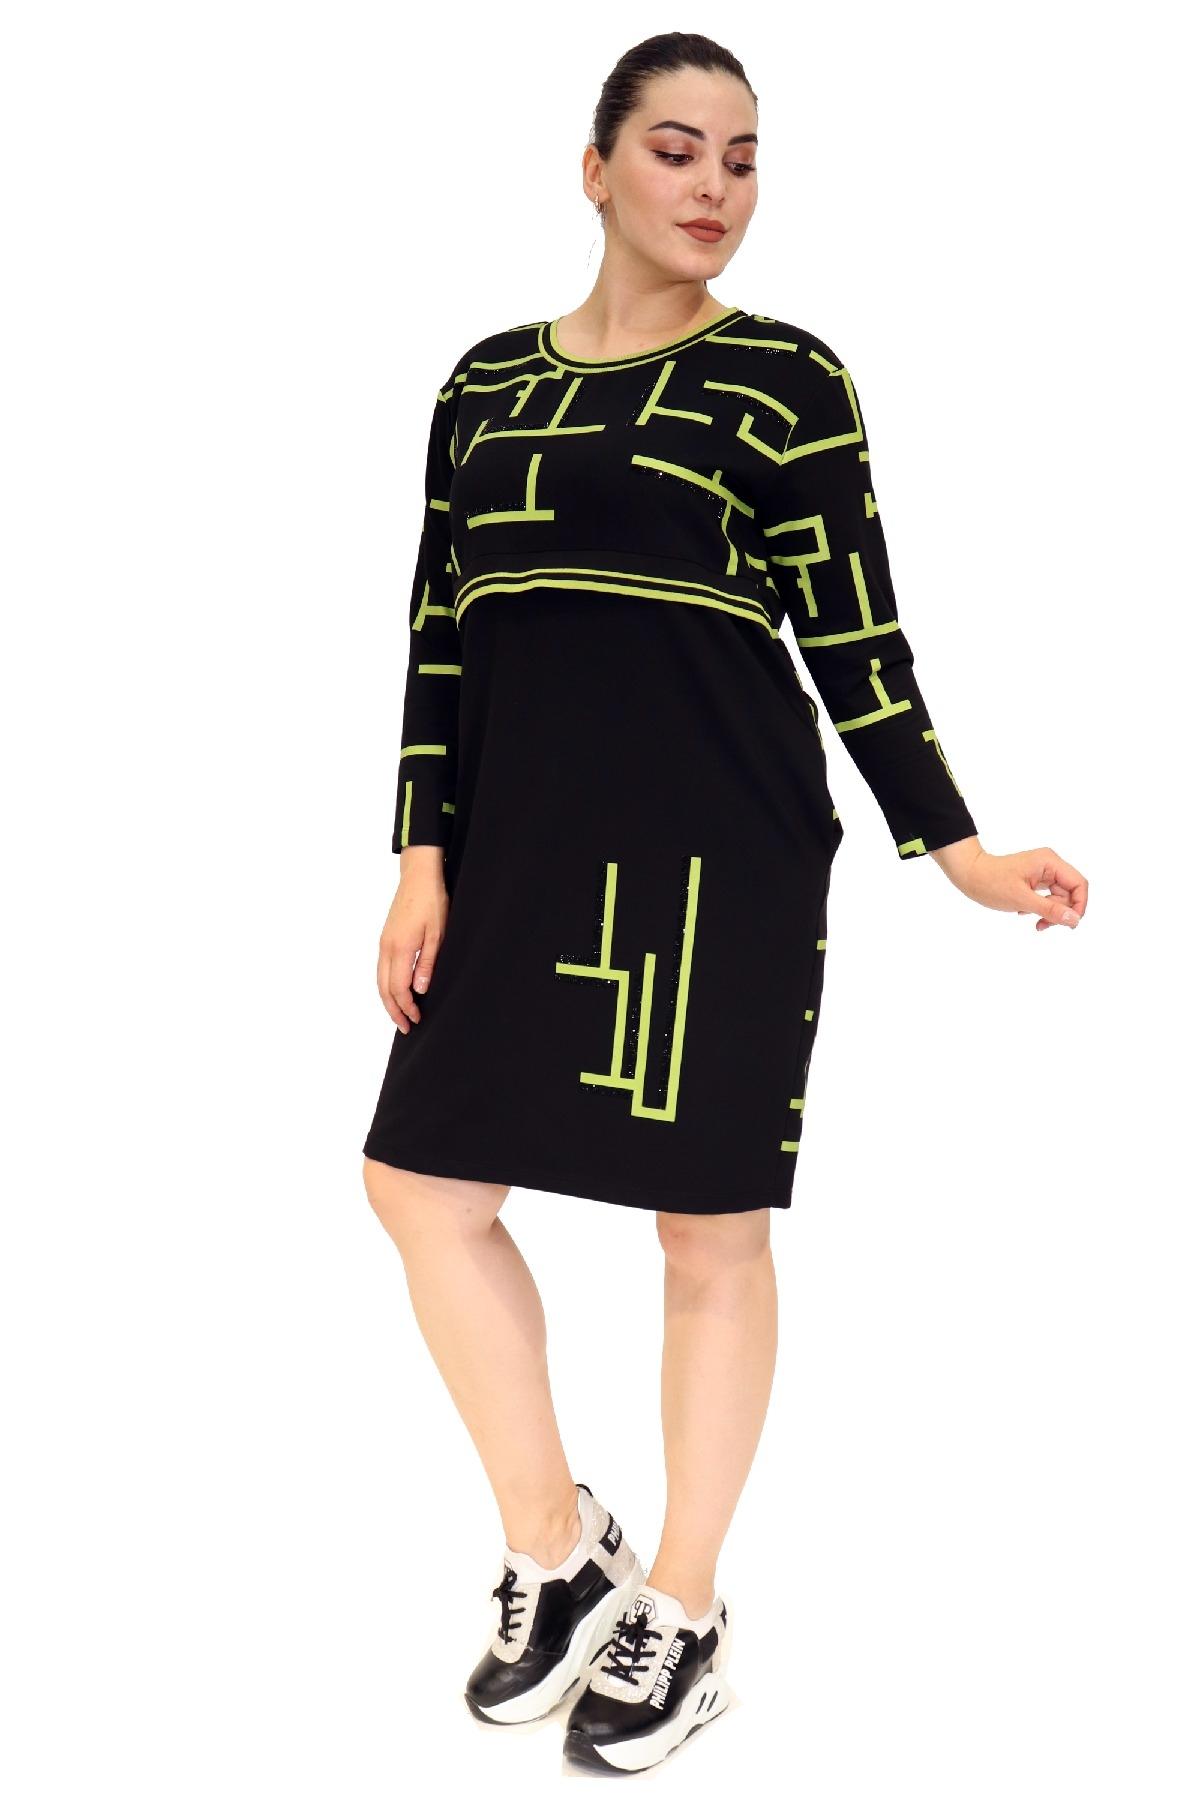 Day Dresses Medium-Neon Green